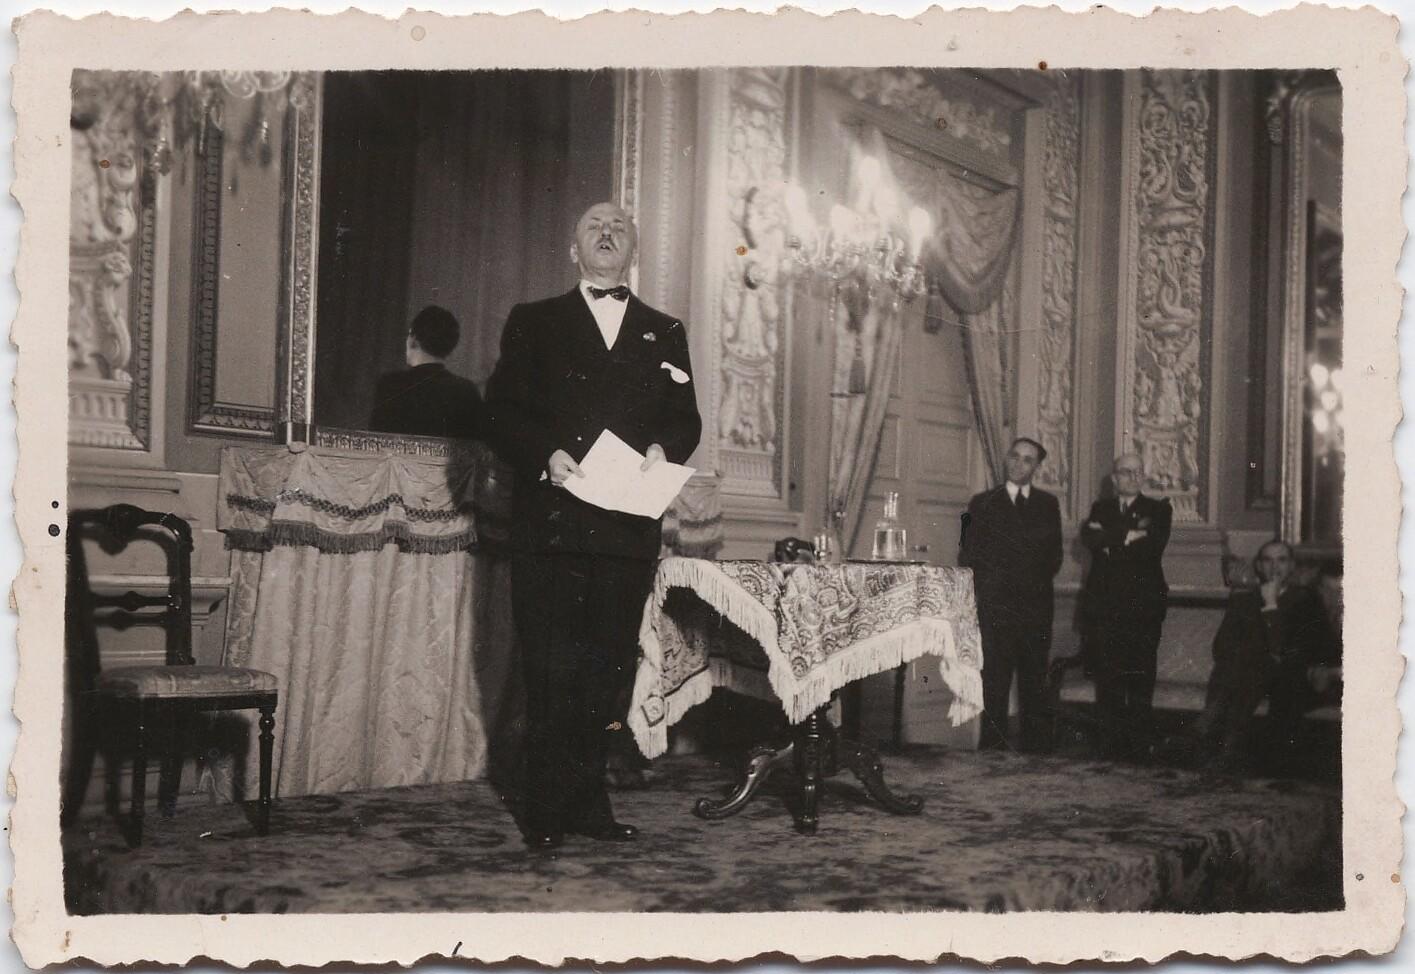 1920-е. Маринетти читает футуристические стихи в аристократическом салоне